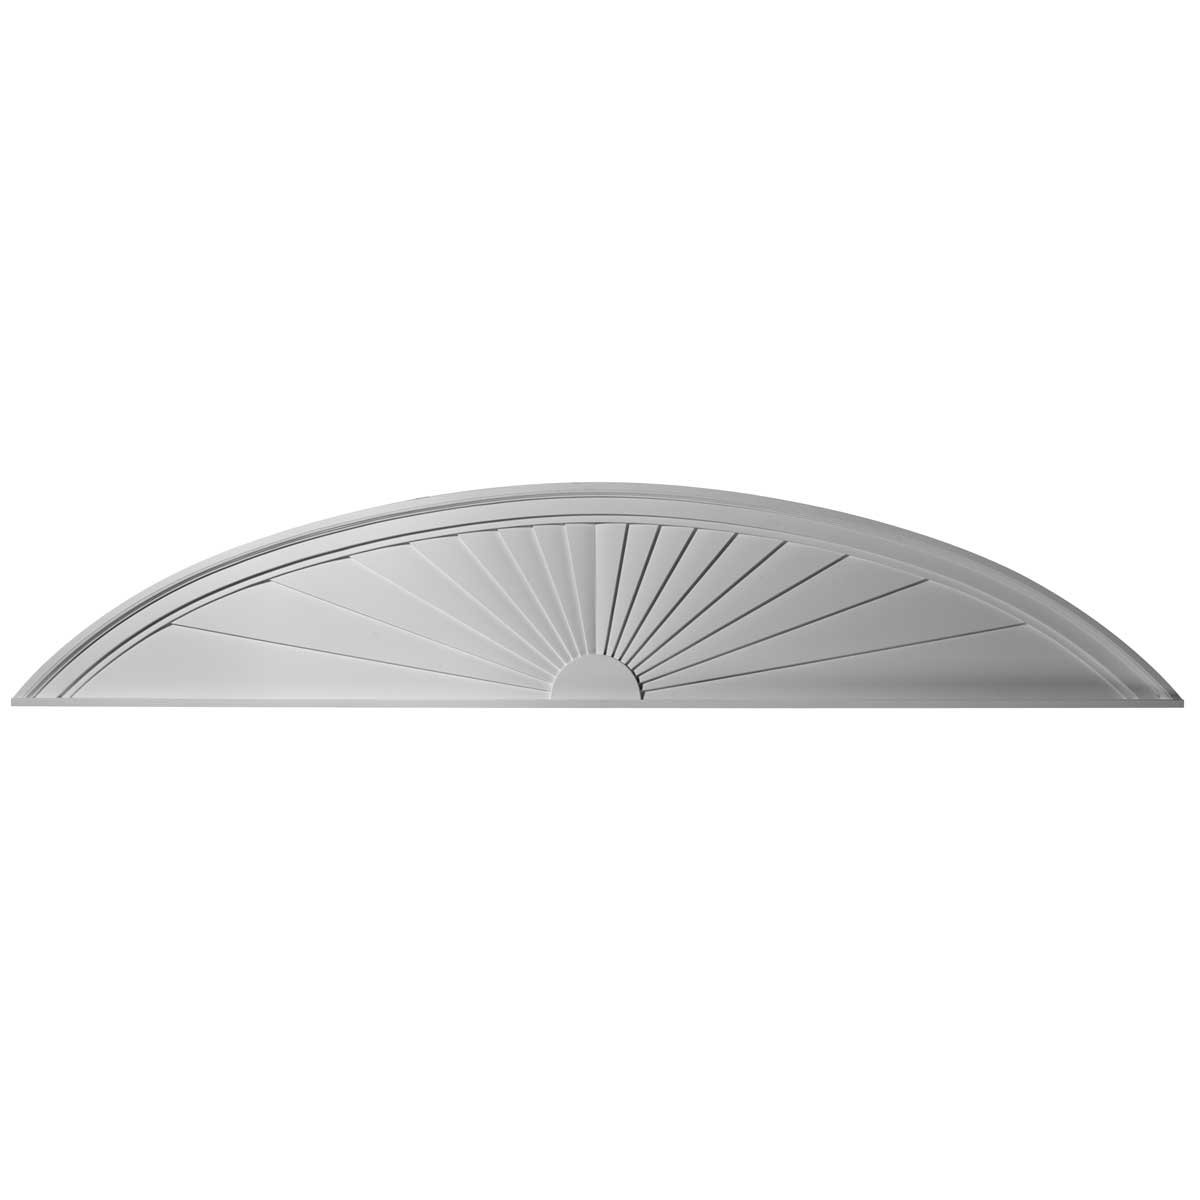 Ekena Millwork PED72X14X02SB 72-Inch W x 14-Inch H x 2-Inch P Half Round Sunburst Pediment